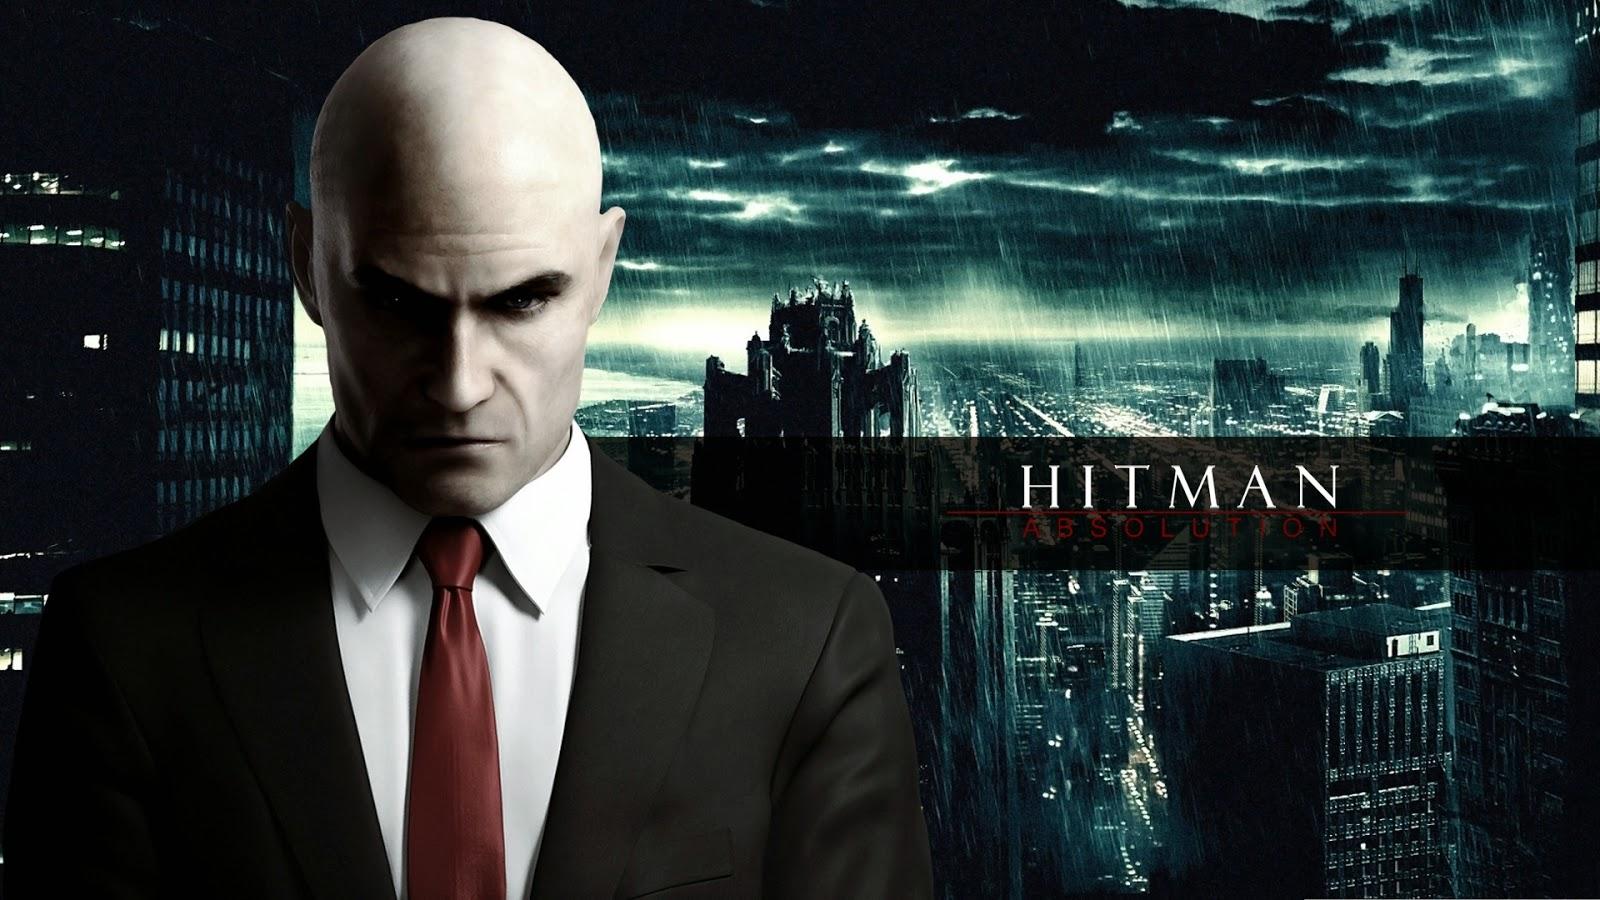 Hitman Agent 47 2015 Movie Wallpapers